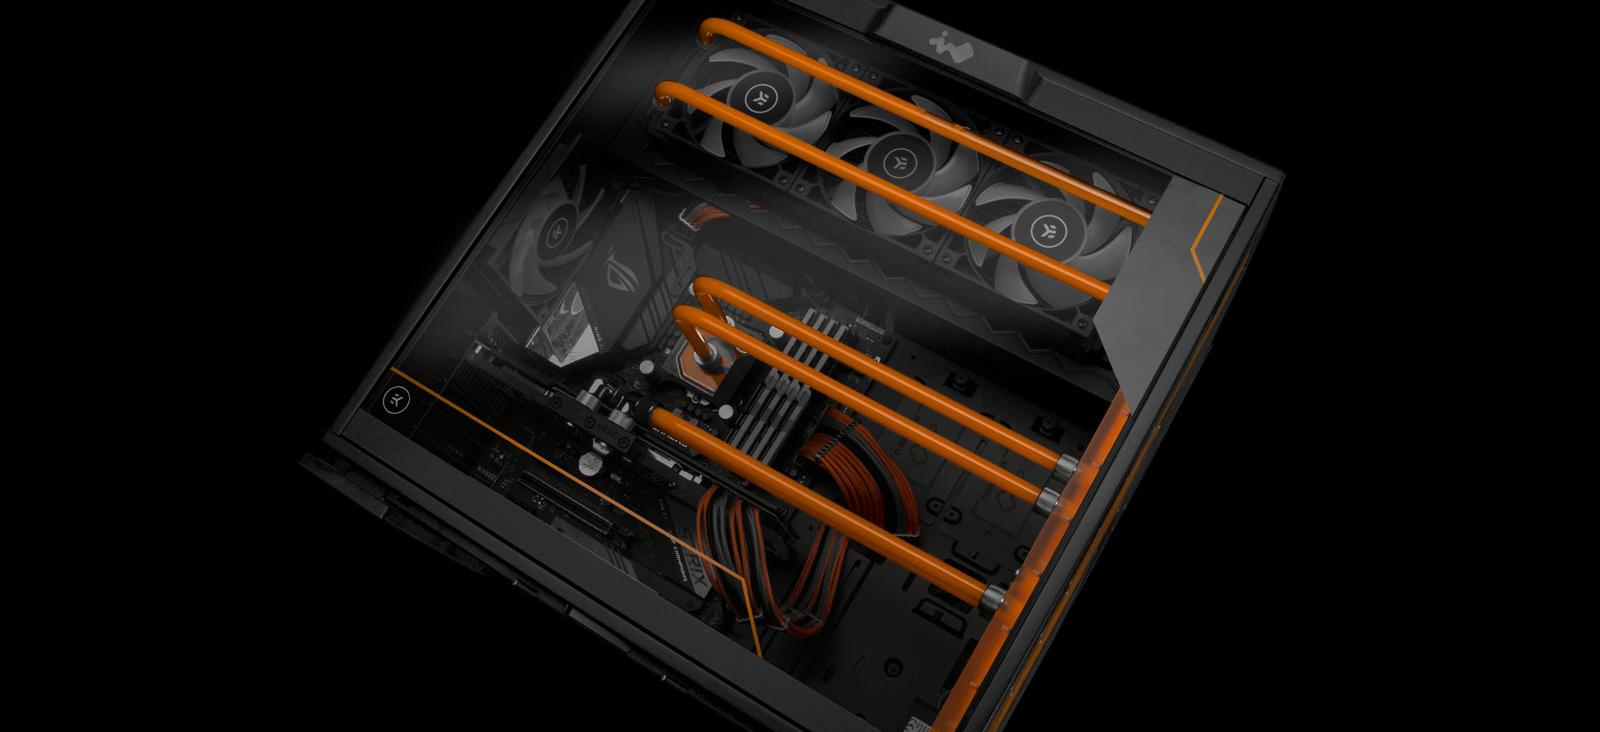 EK-Classic InWin 303EK water cooled case